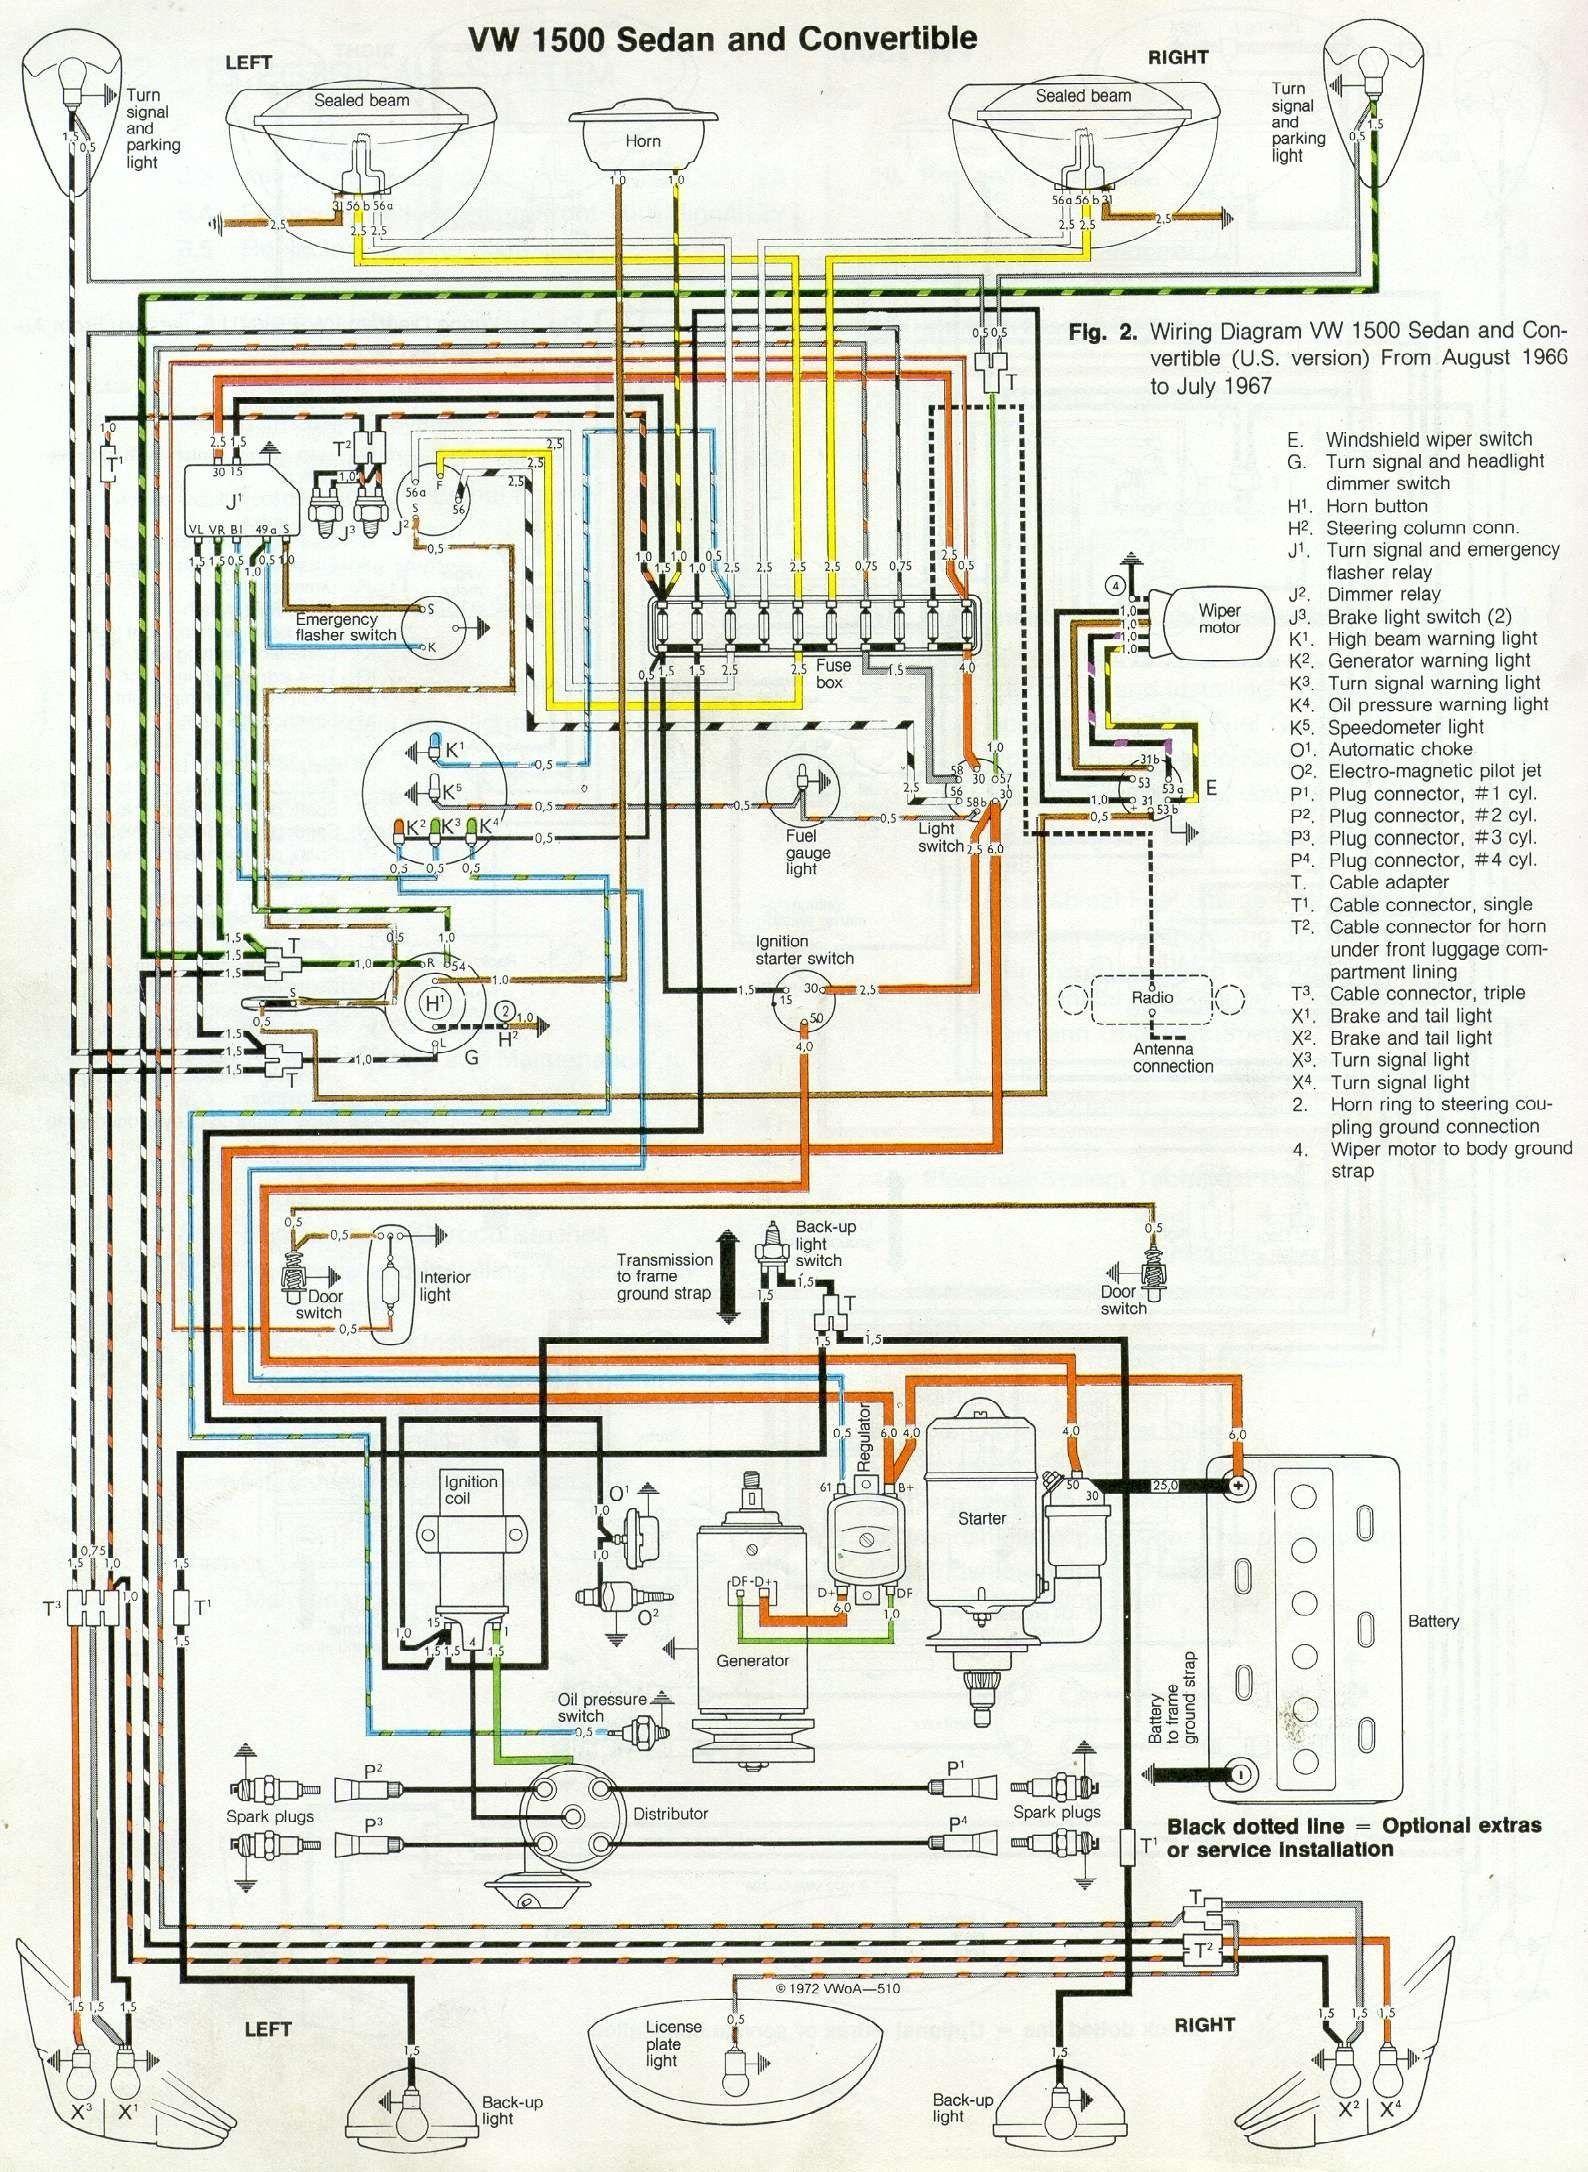 Image Result For 67 Vw Bug Wiring Diagram Vw Super Beetle Vw Beetles Volkswagen Beetle